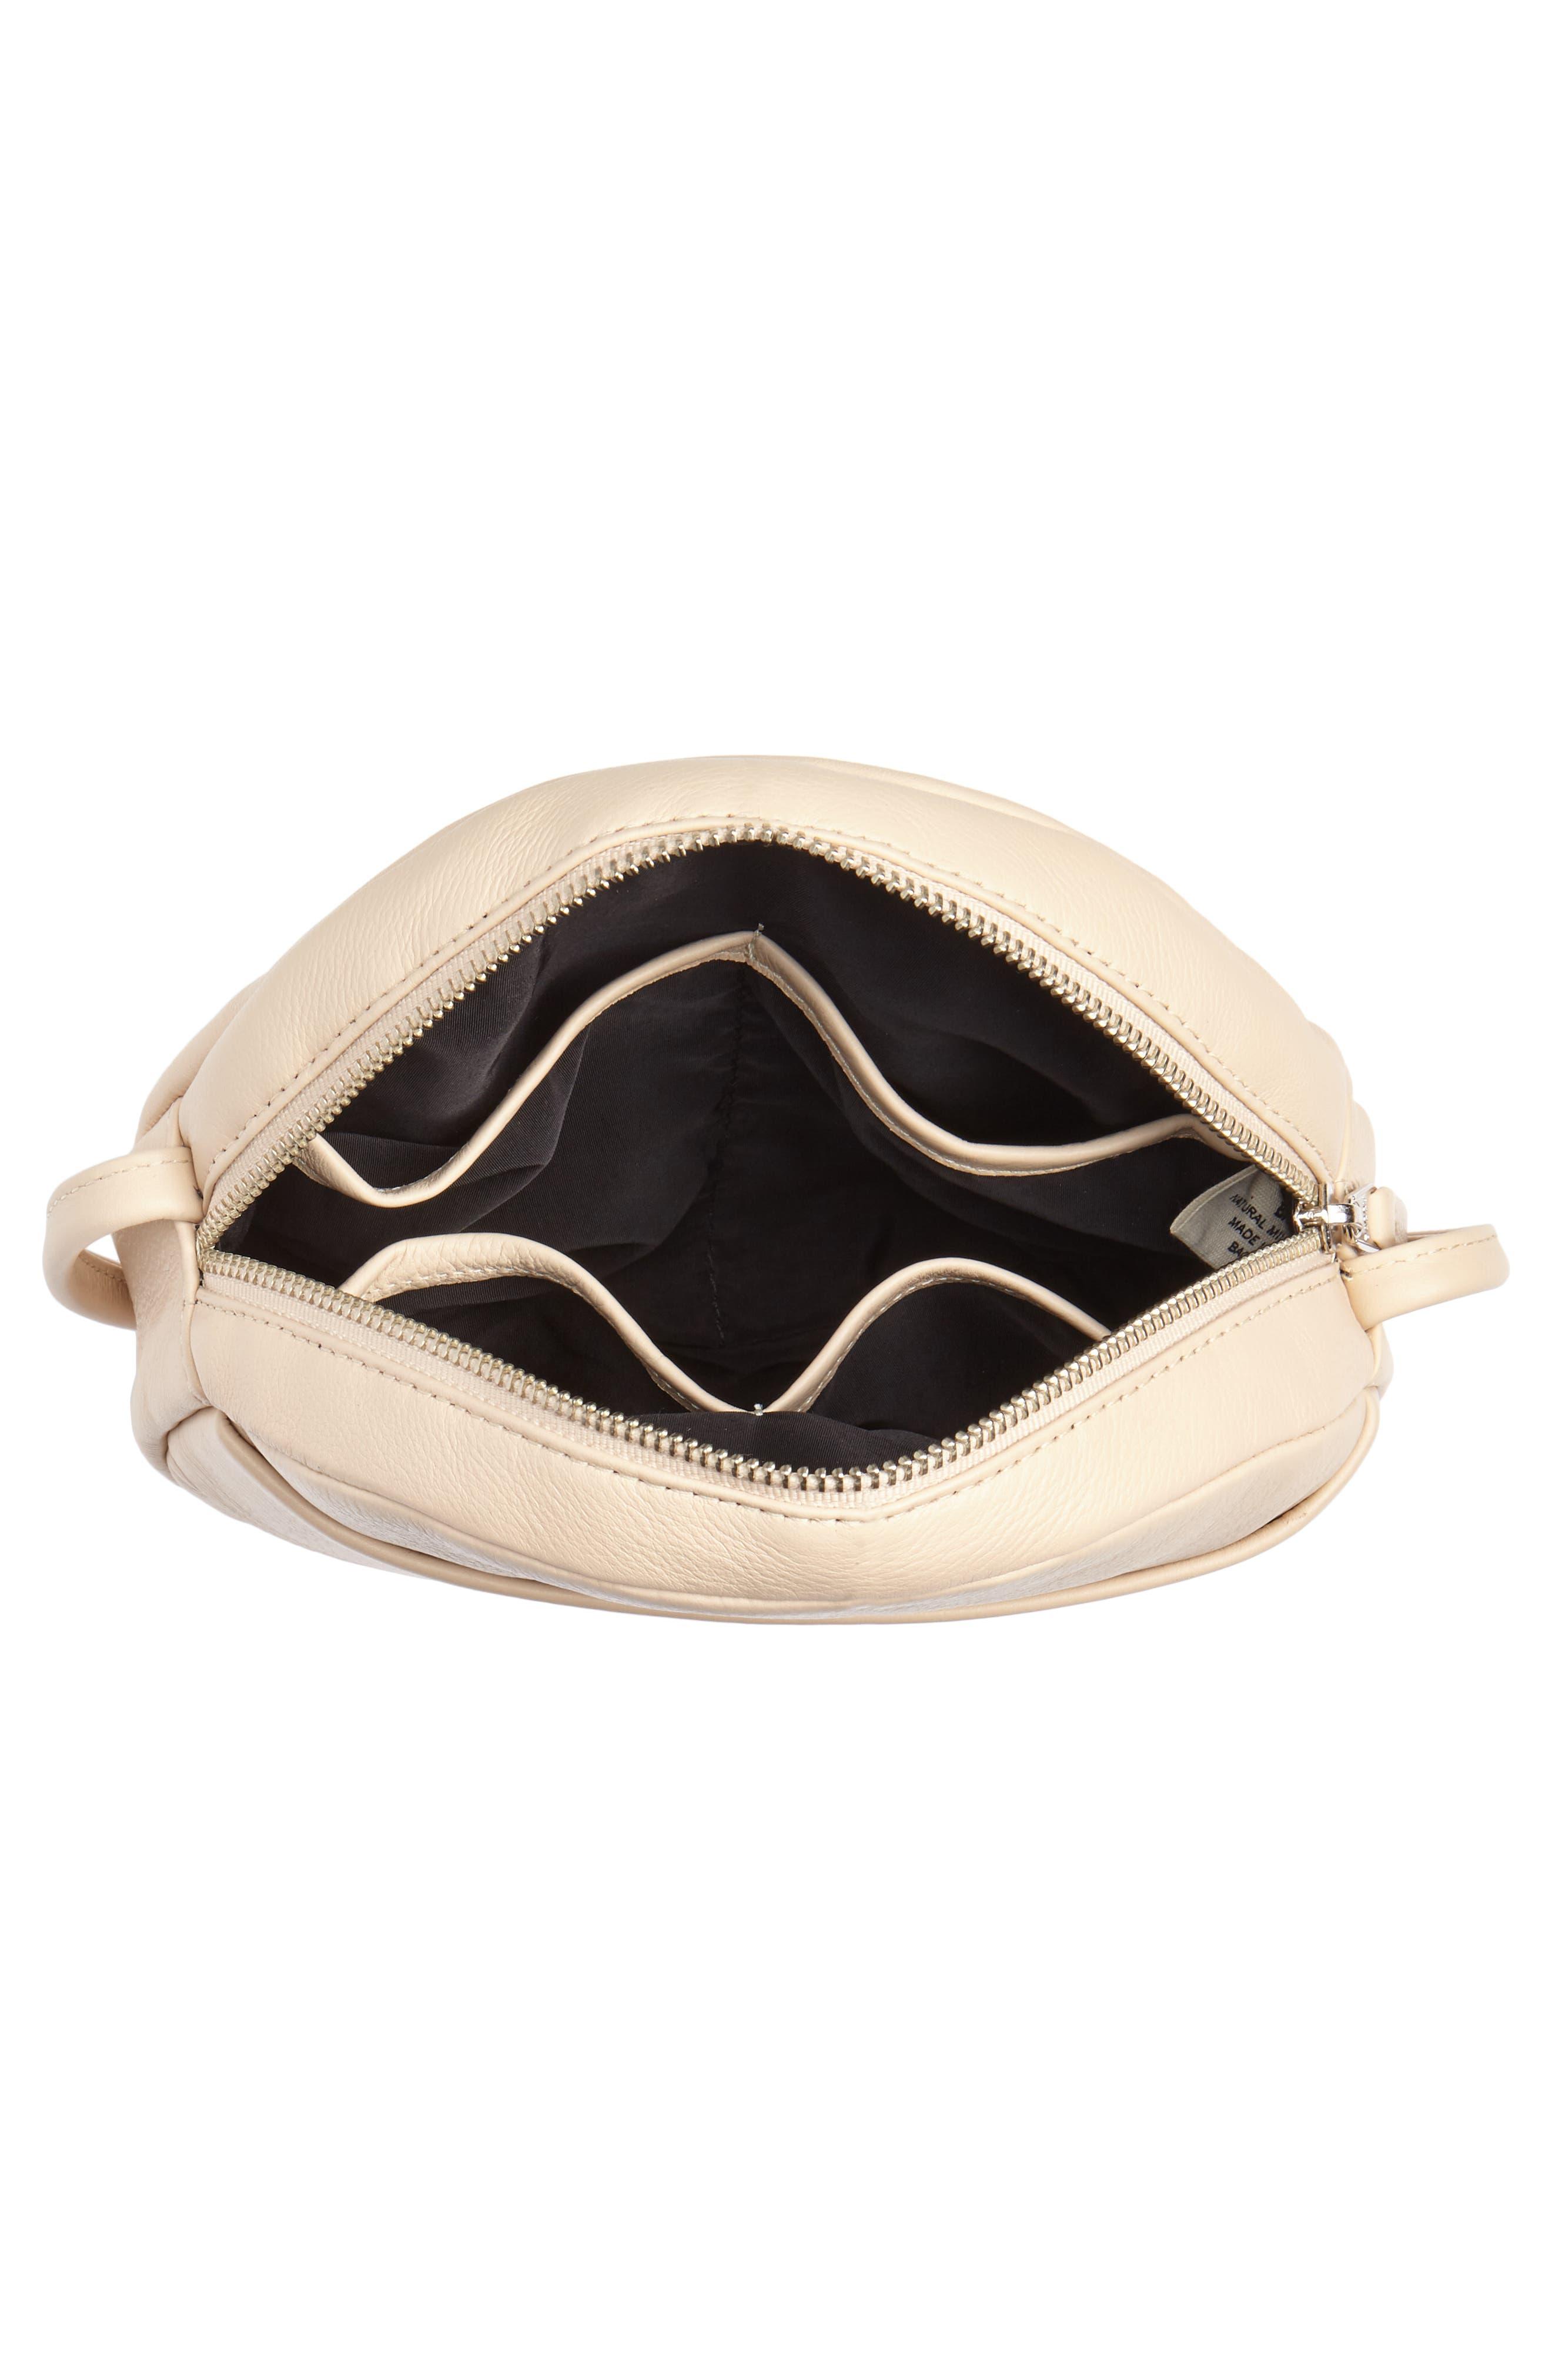 Circle Calfskin Leather Crossbody Bag,                             Alternate thumbnail 12, color,